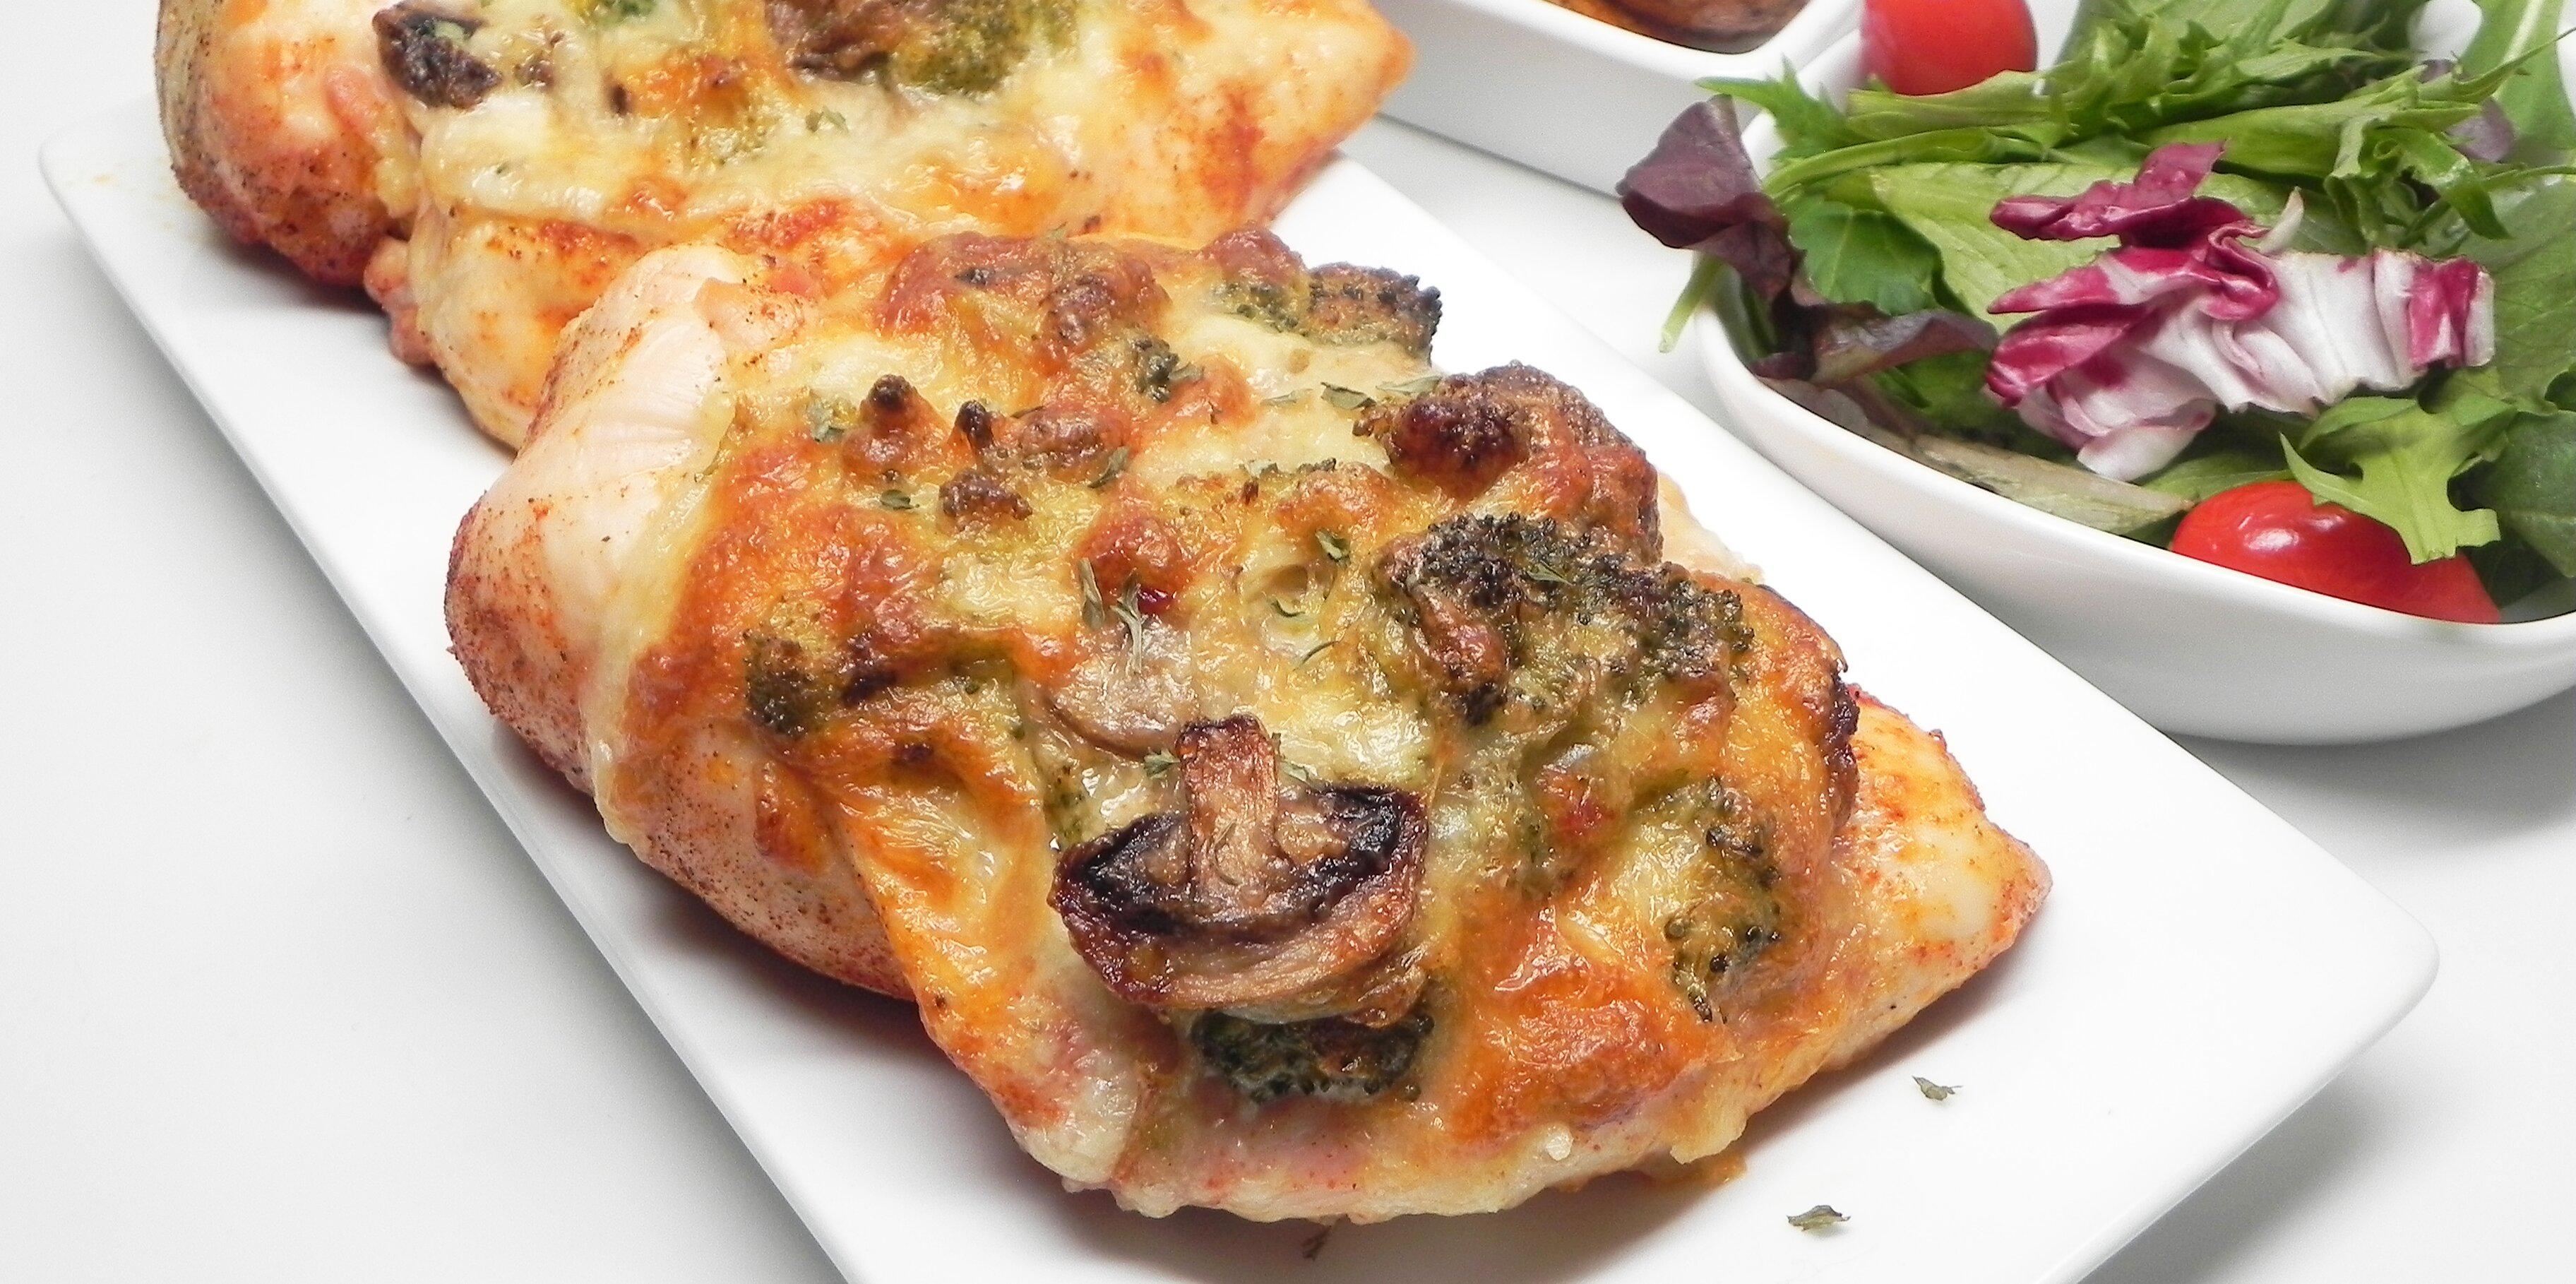 mushroom broccoli and cheese stuffed chicken recipe